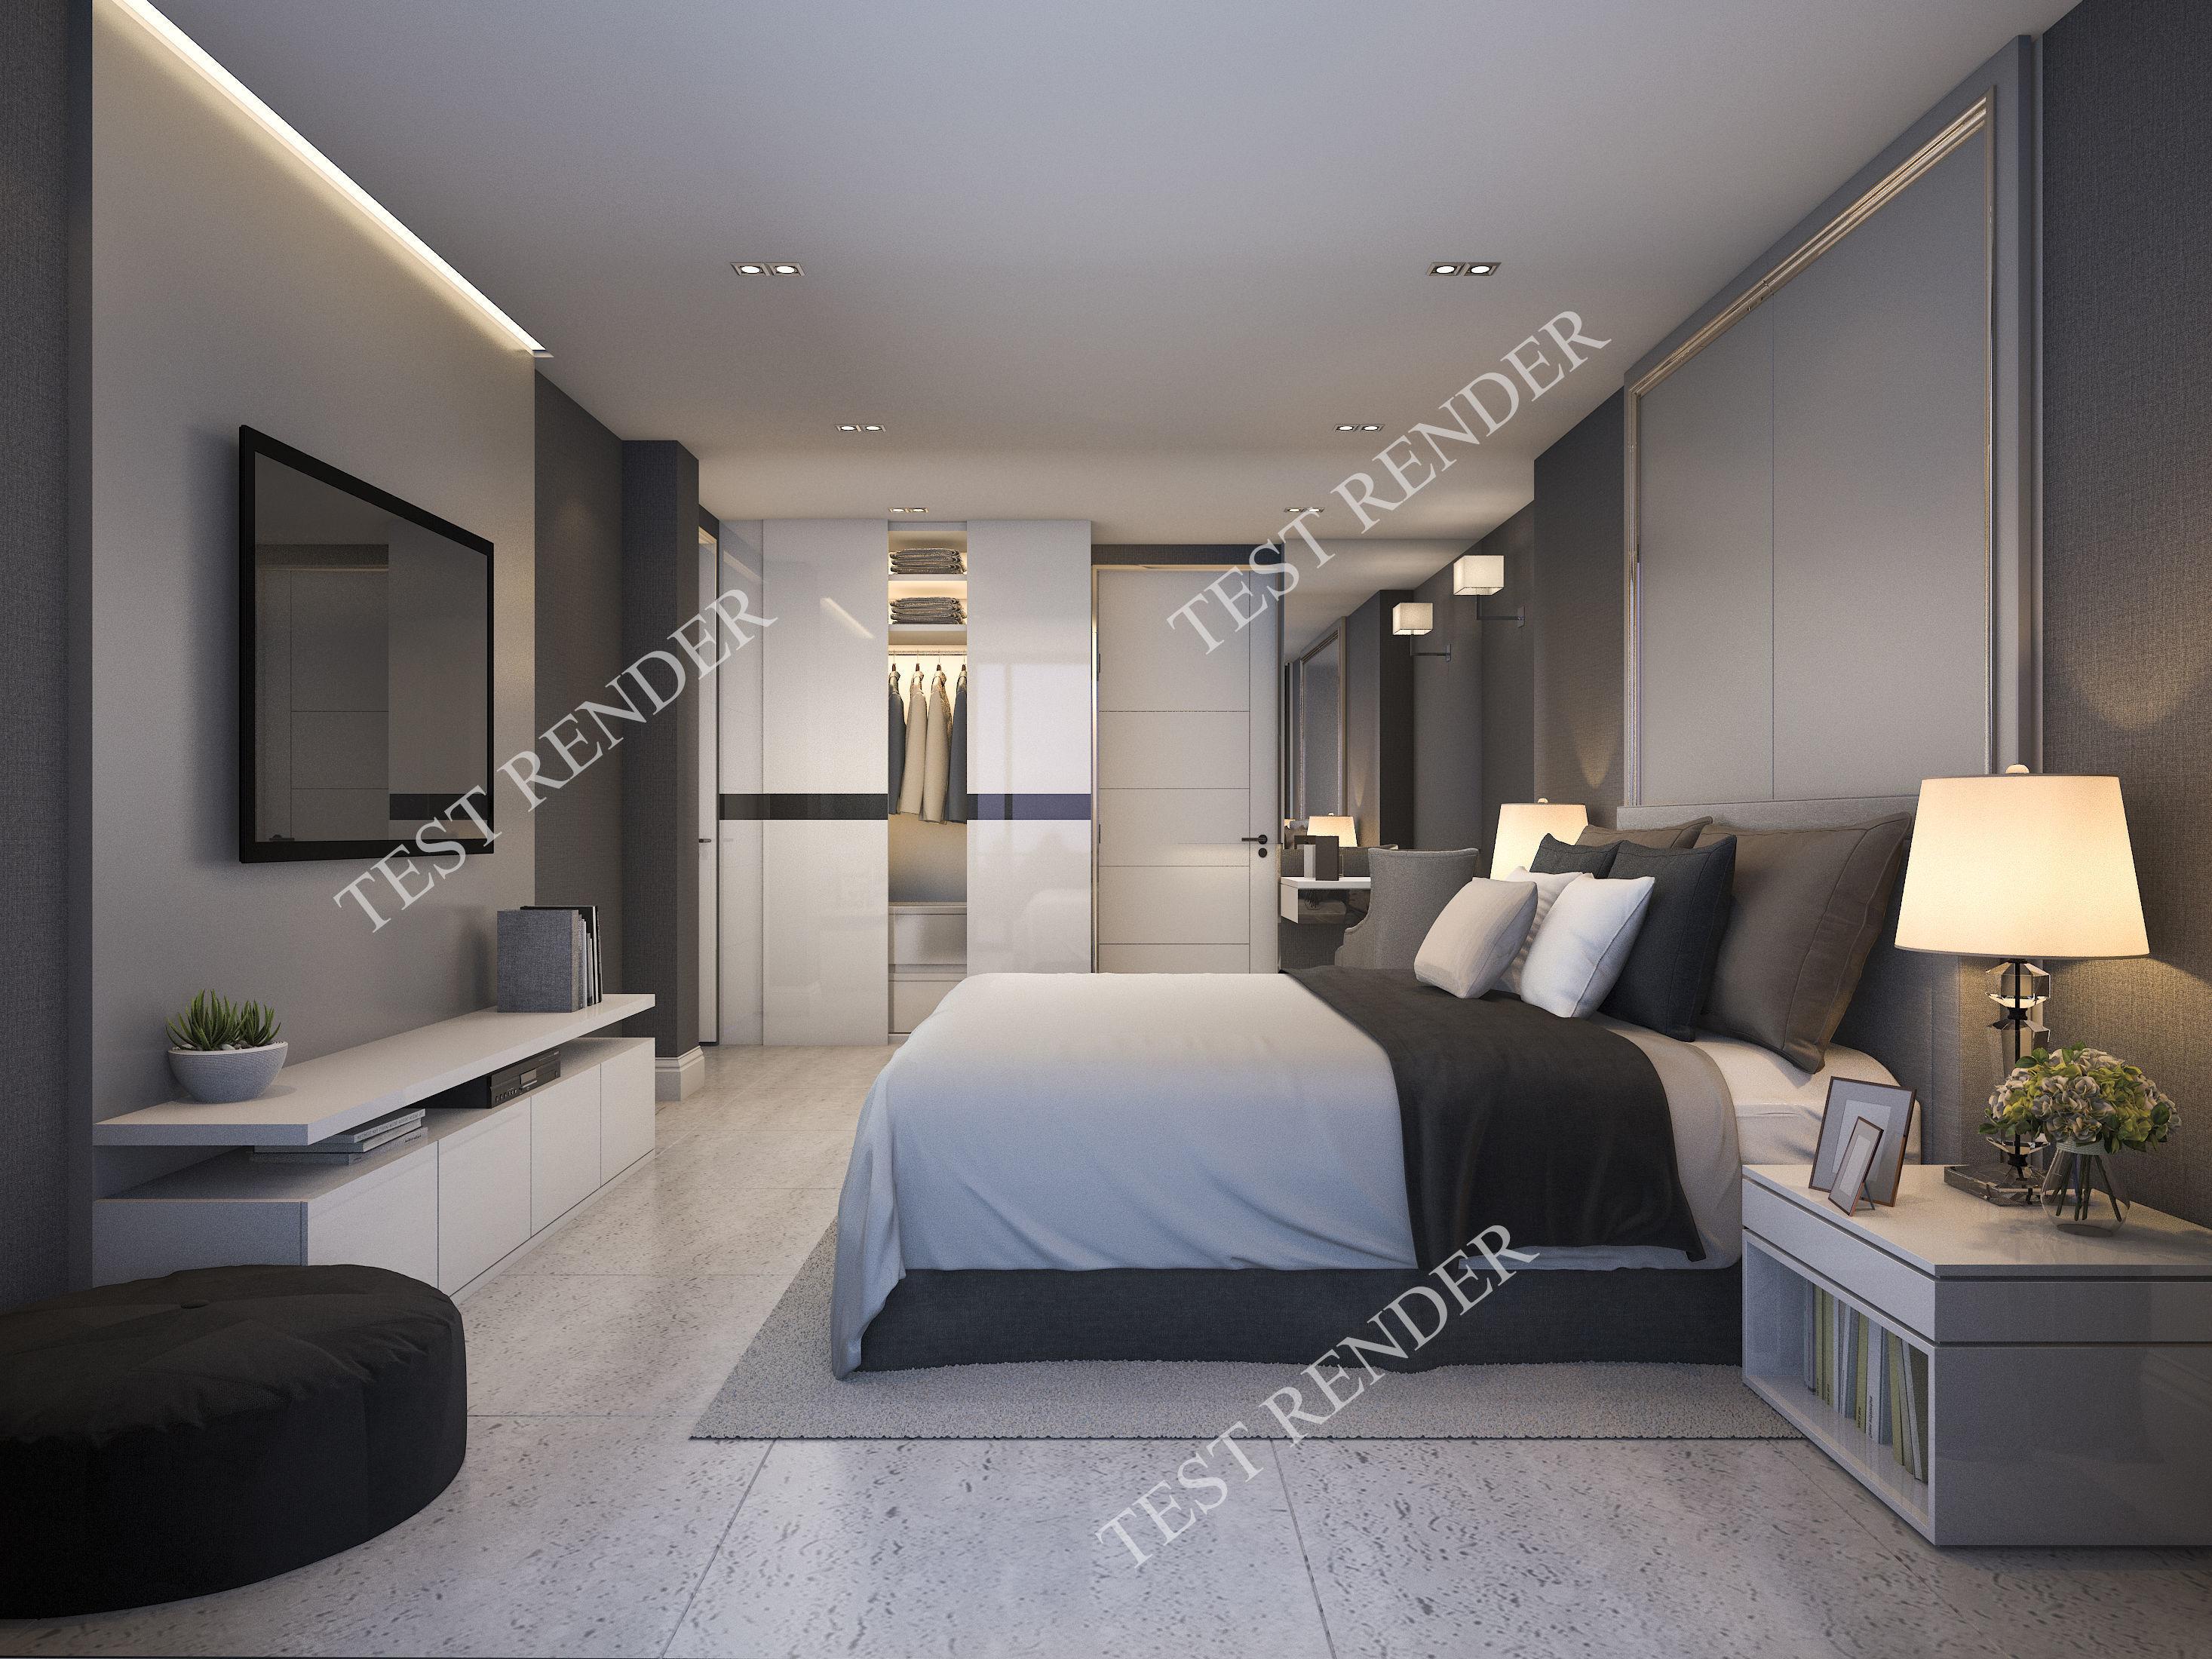 bedroom modern luxury. 3d Modern Luxury Bedroom Suite In Hotel With Wardrobe Model Max 3ds Fbx 1